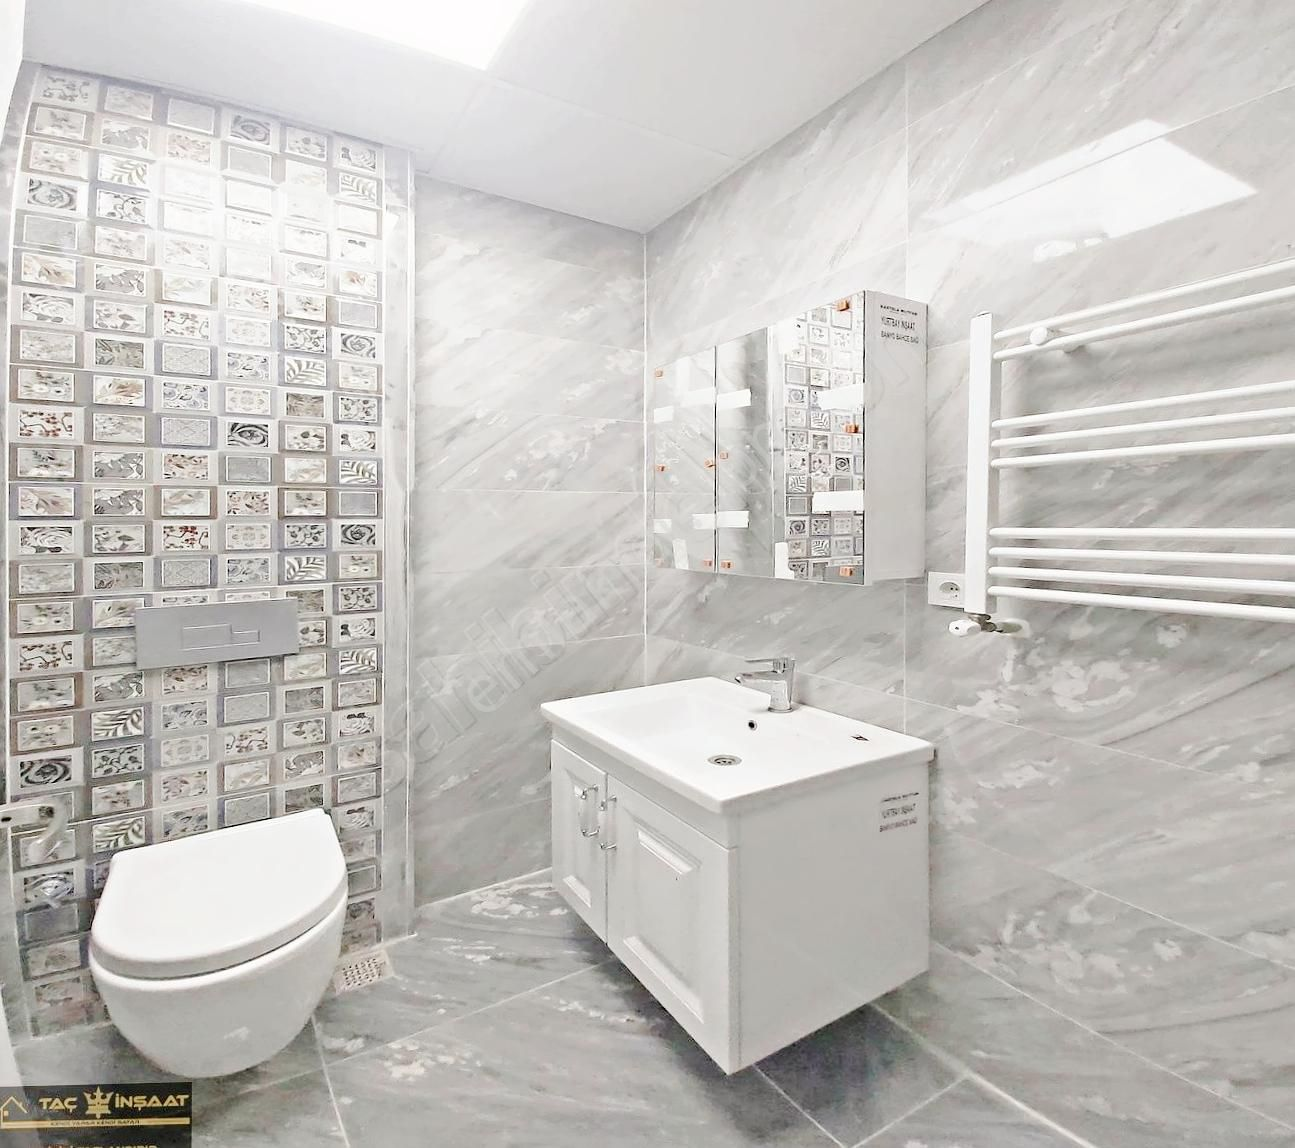 https://imaj.emlakjet.com/oda/watermarked-image/test/2021-9-1/edited-9665795/244708578-edited.jpg